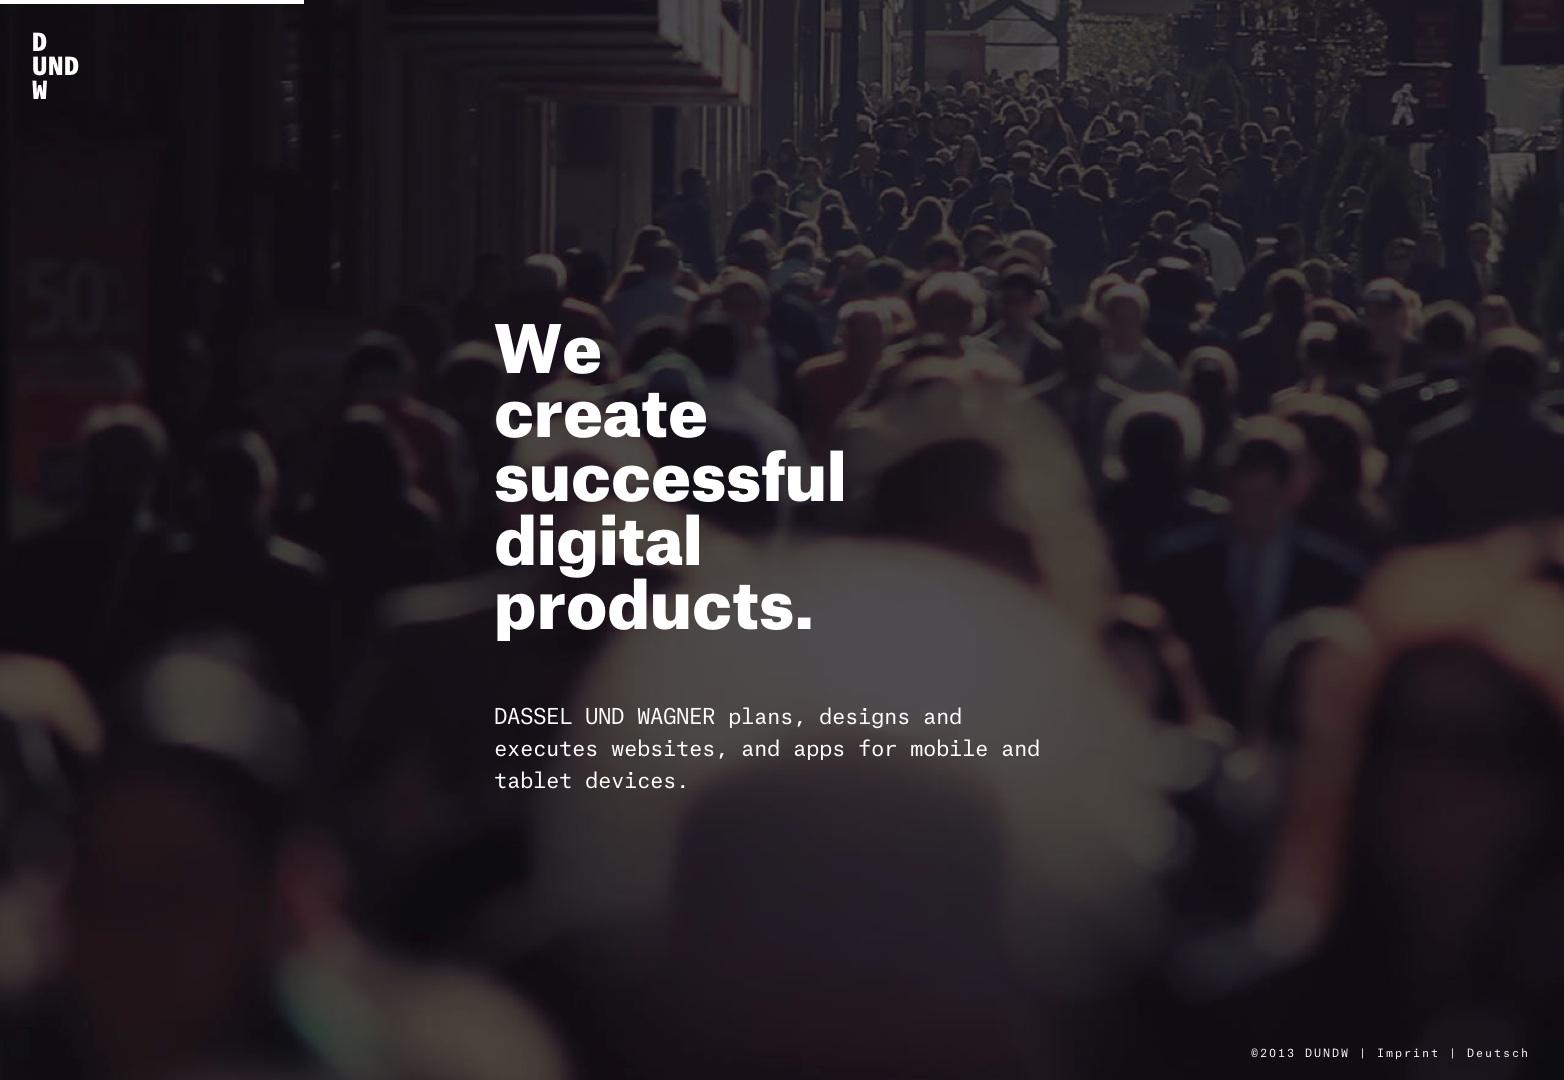 DASSEL UND WAGNER   Creamos productos digitales.